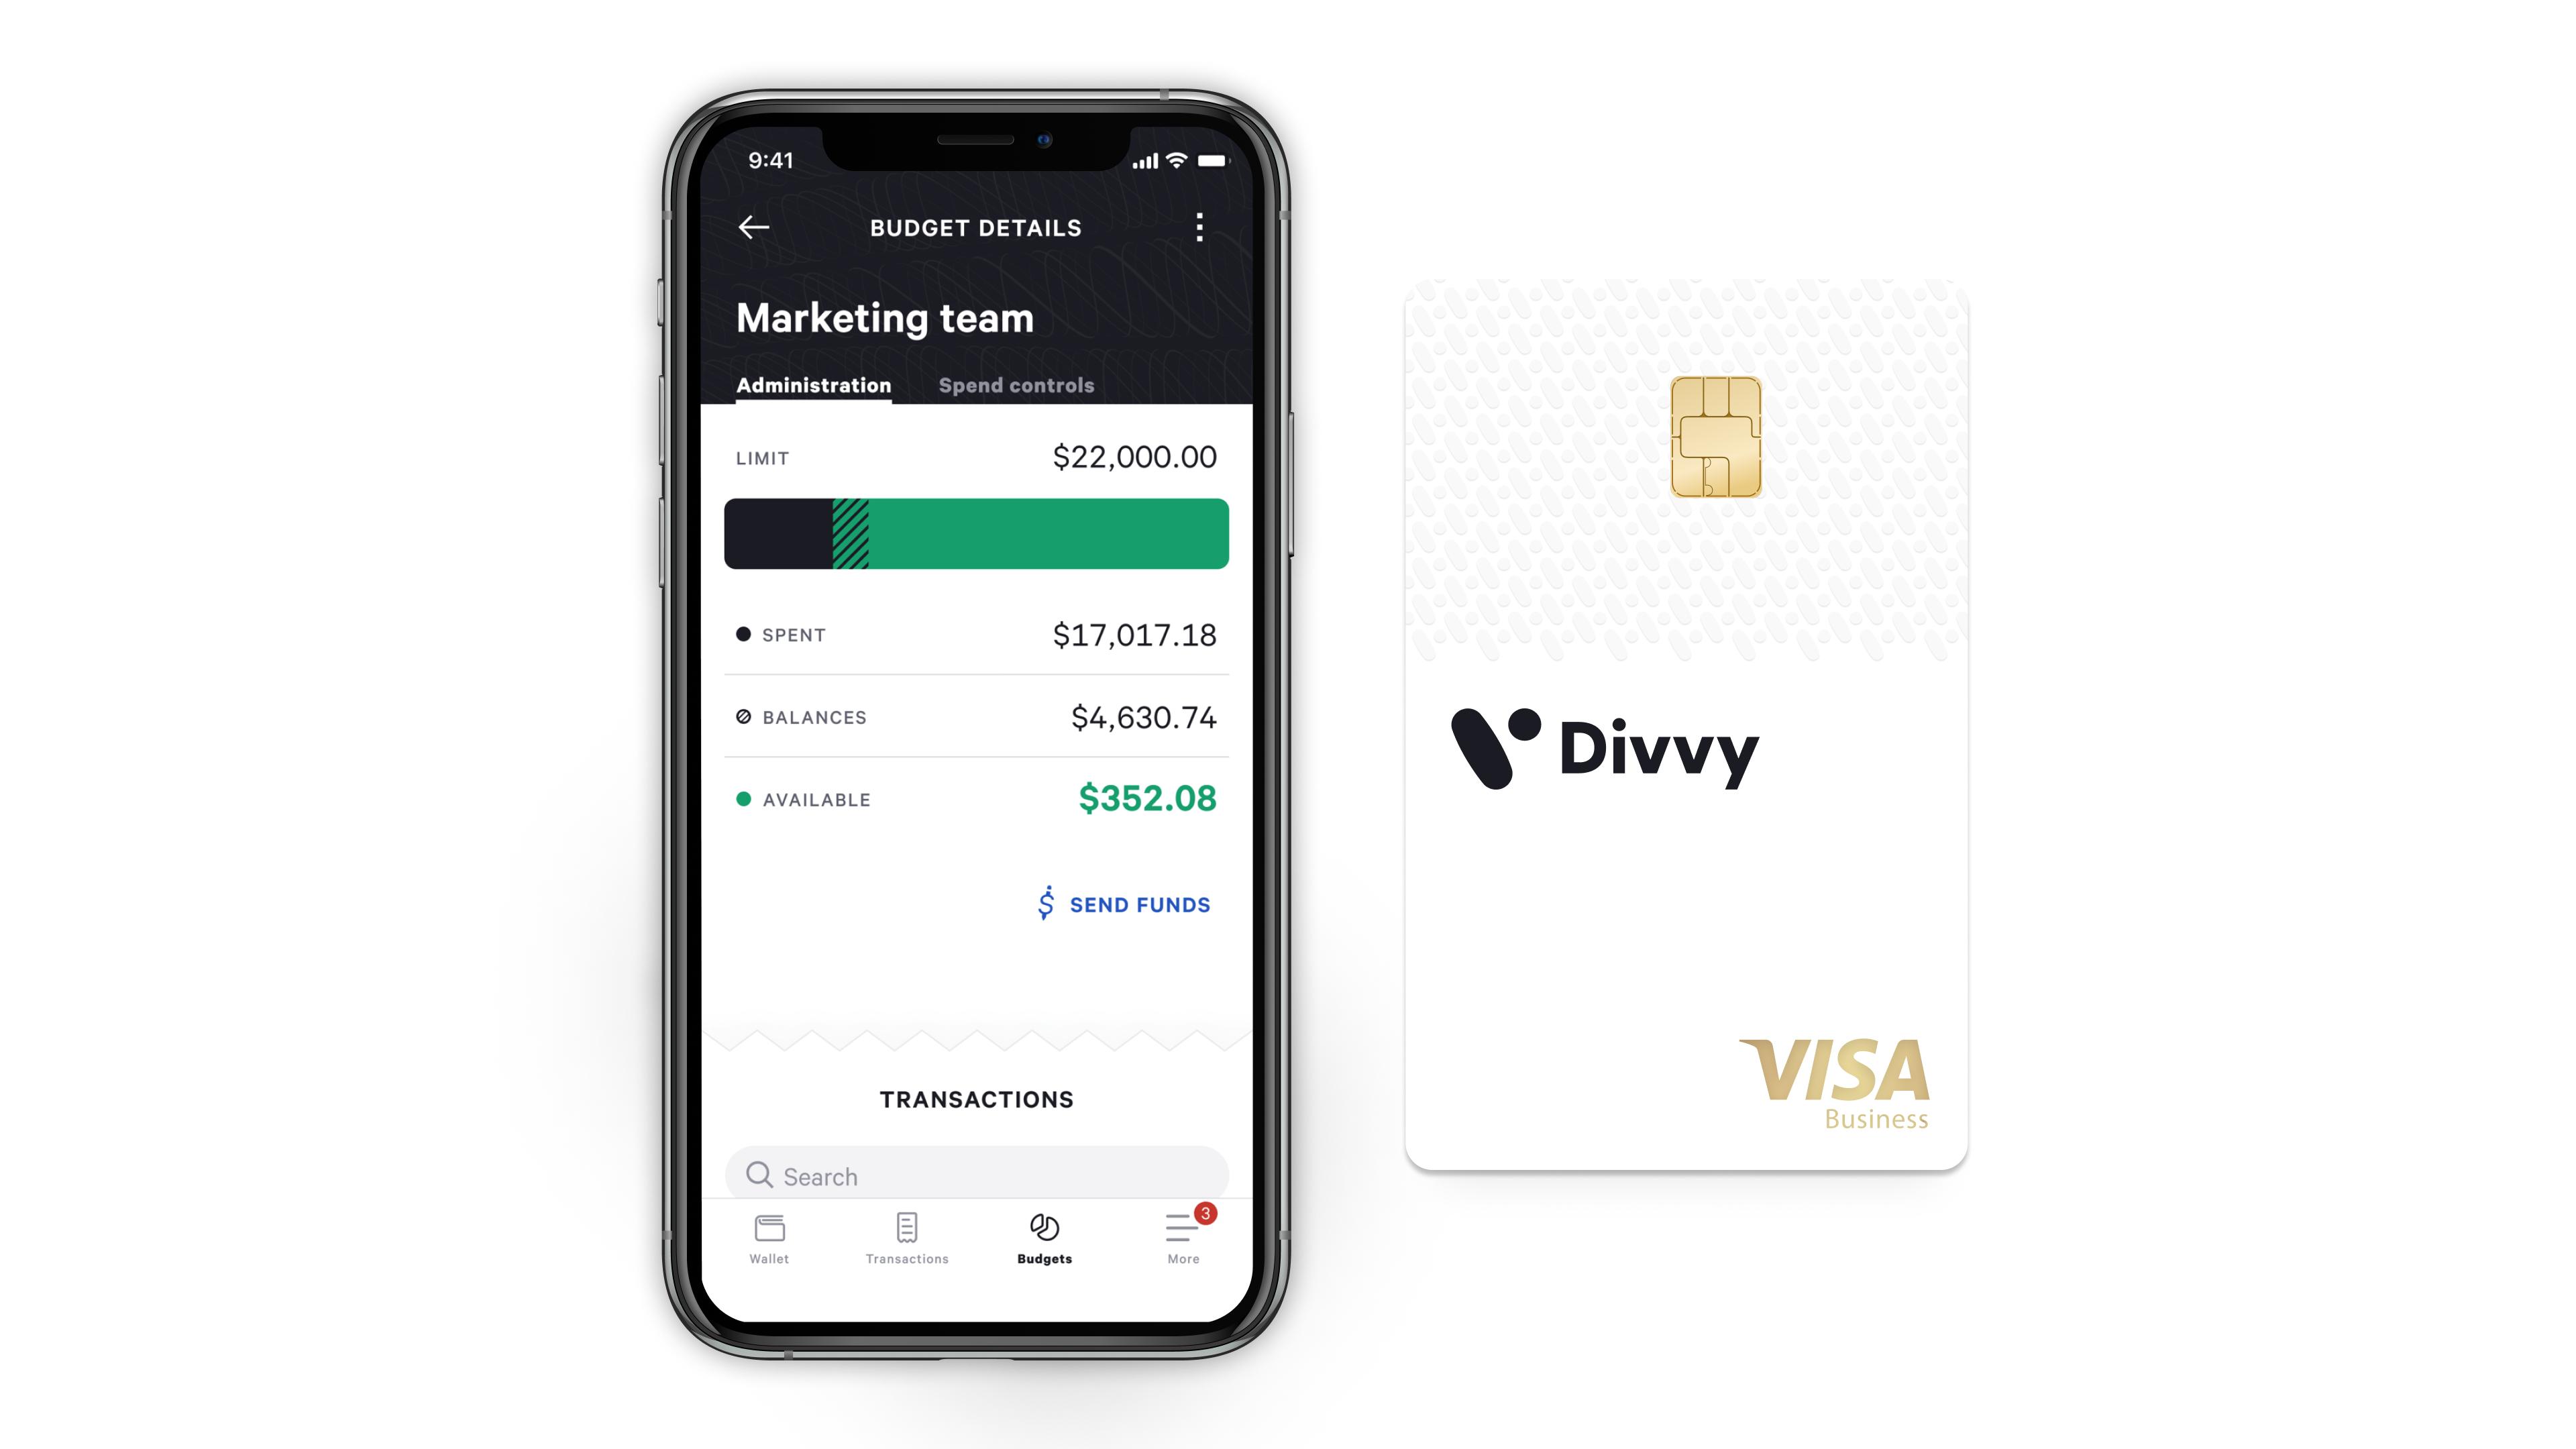 Divvy Software - Divvy